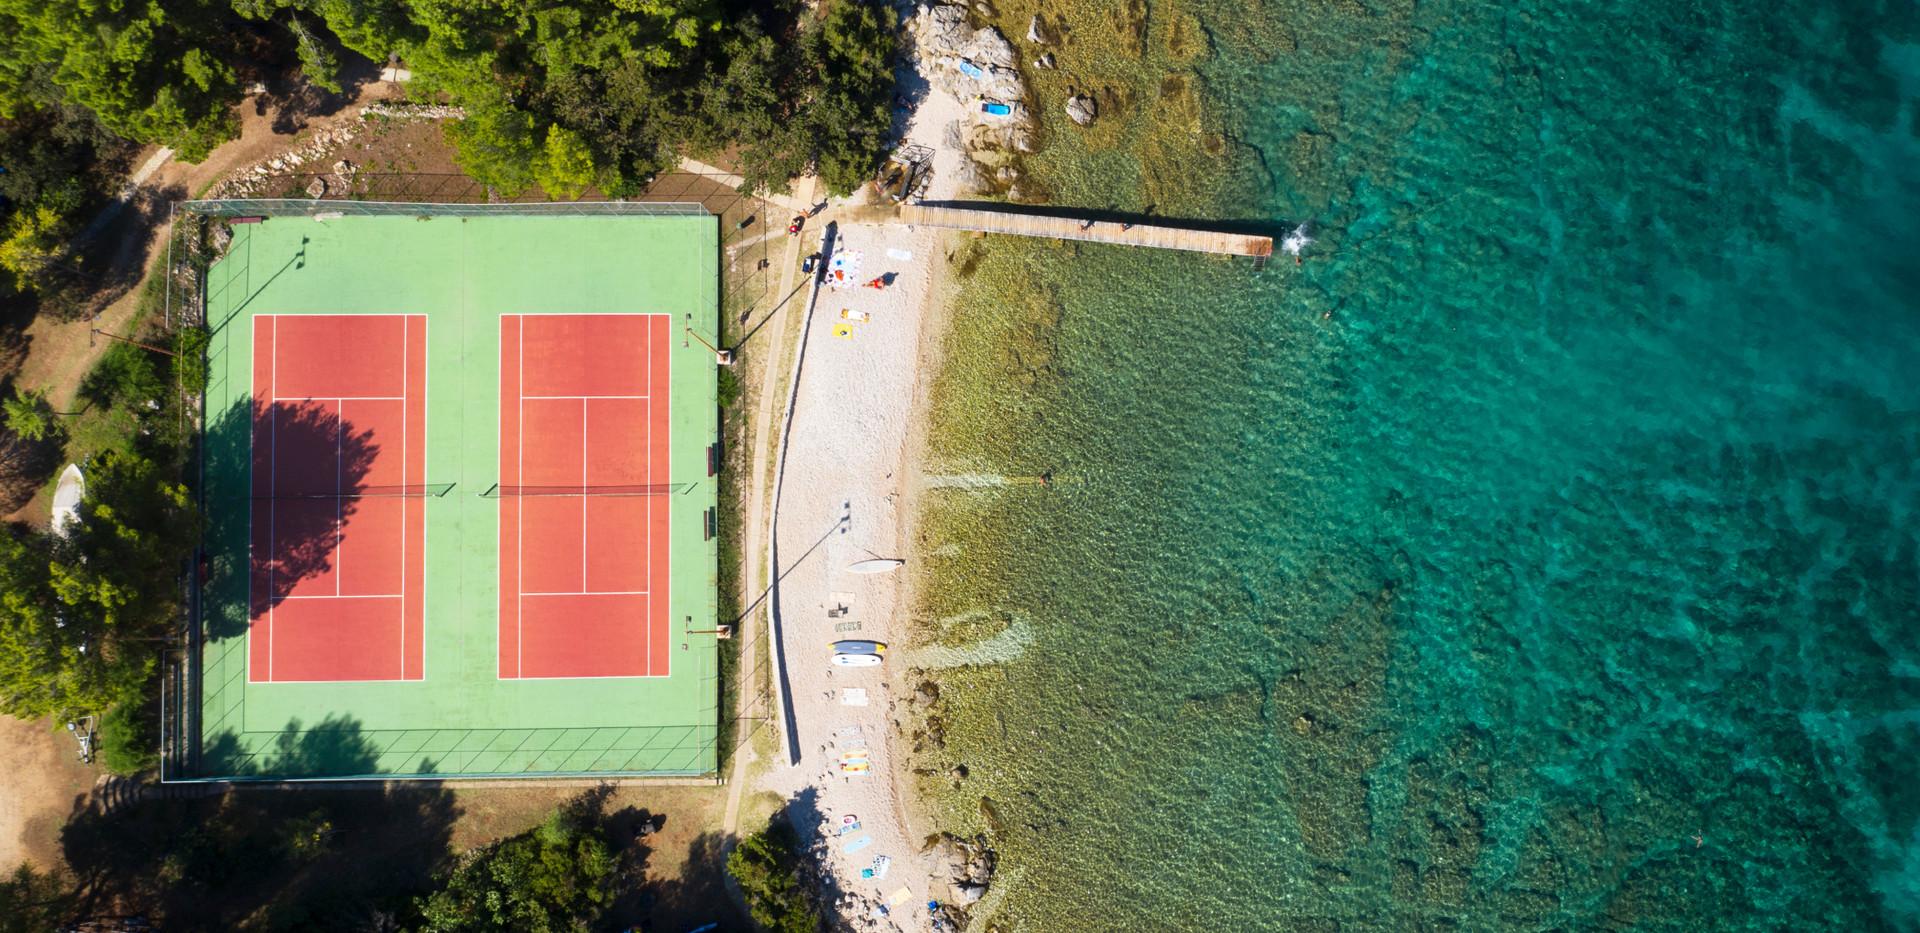 Tennis&swimming.jpg